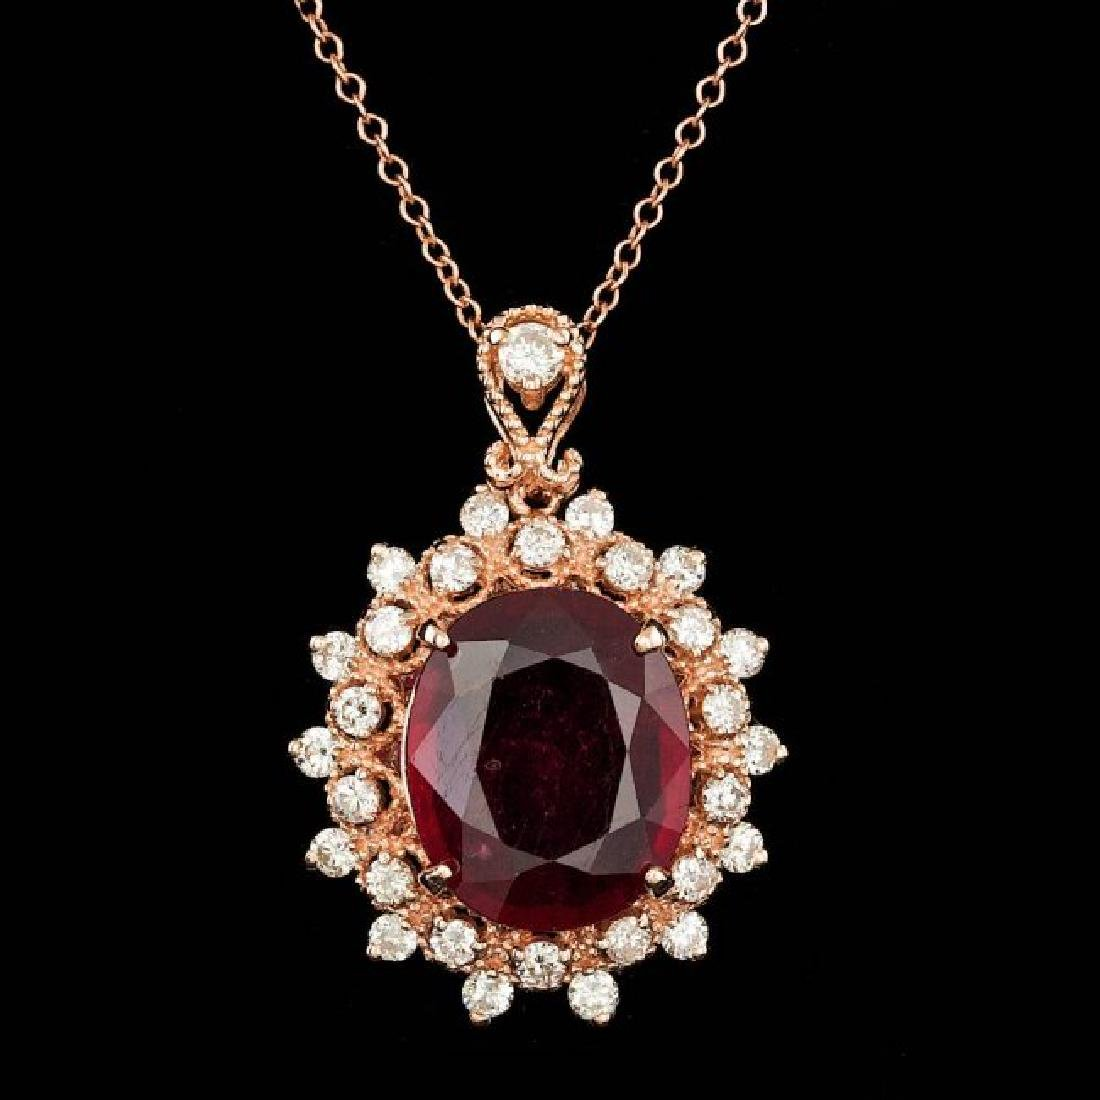 14k Rose Gold 6.50ct Ruby 0.90ct Diamond Pendant